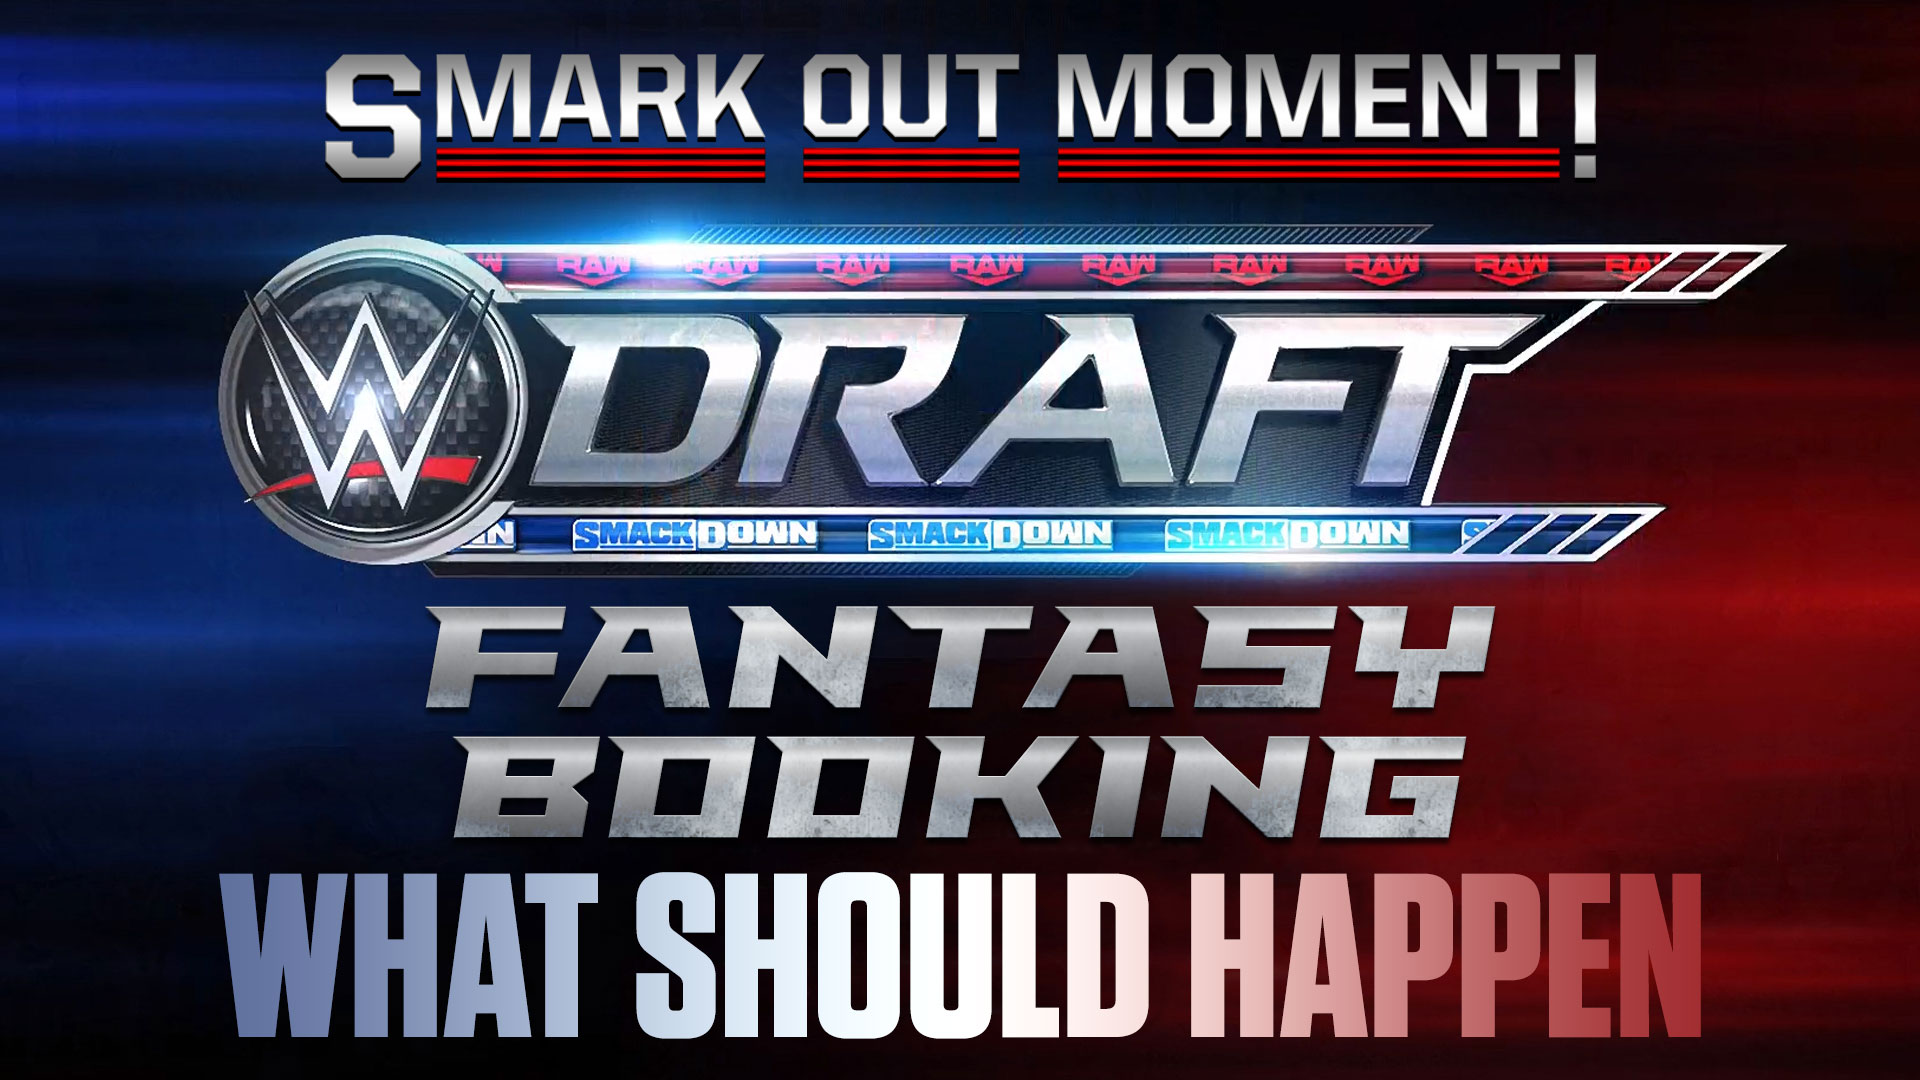 Fantasy Booking WWE Draft superstars